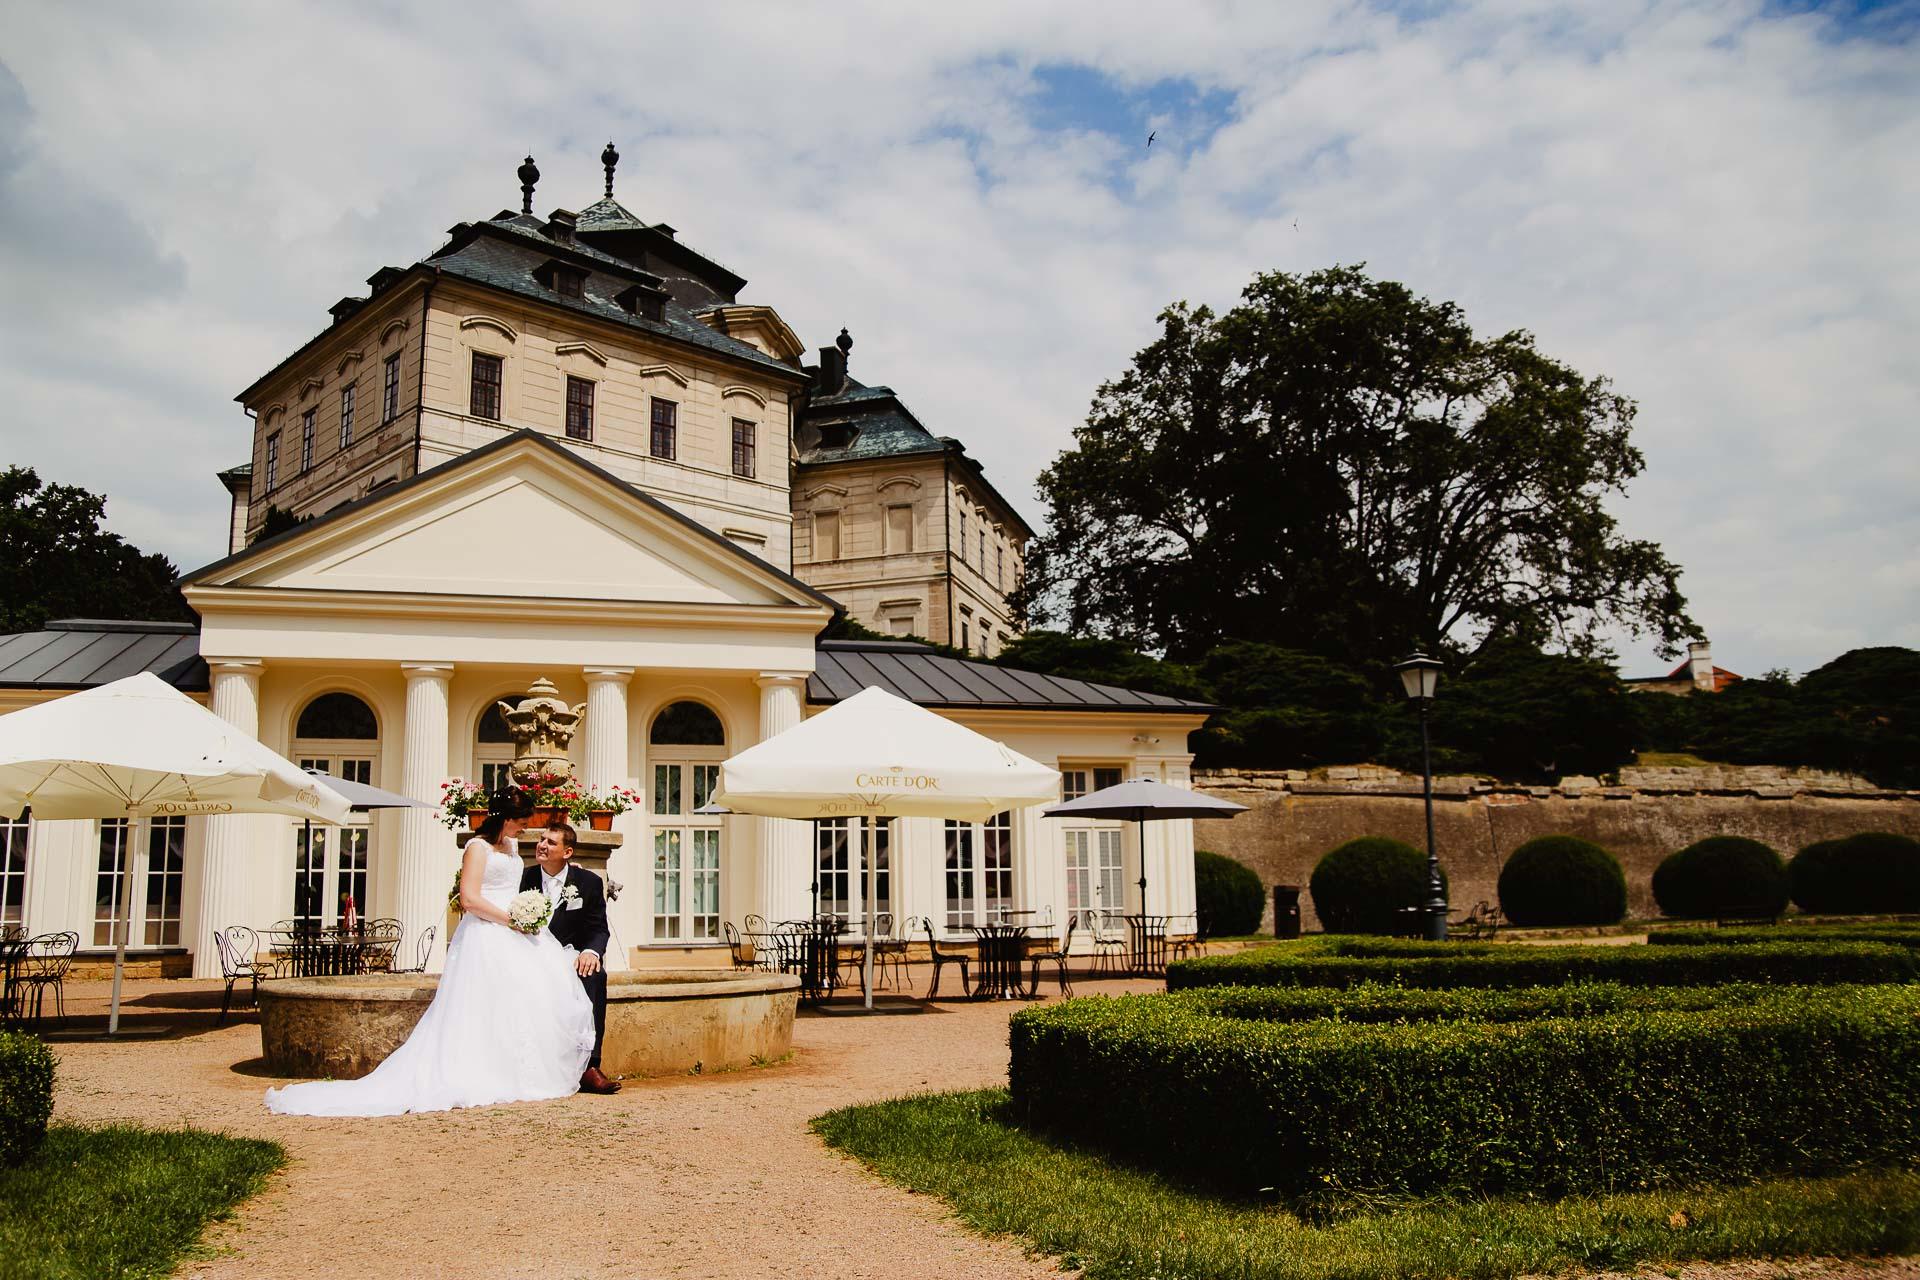 Svatební-fotograf-zámek-Karlova-Koruna-Chlumec-nad-Cidlinou-160